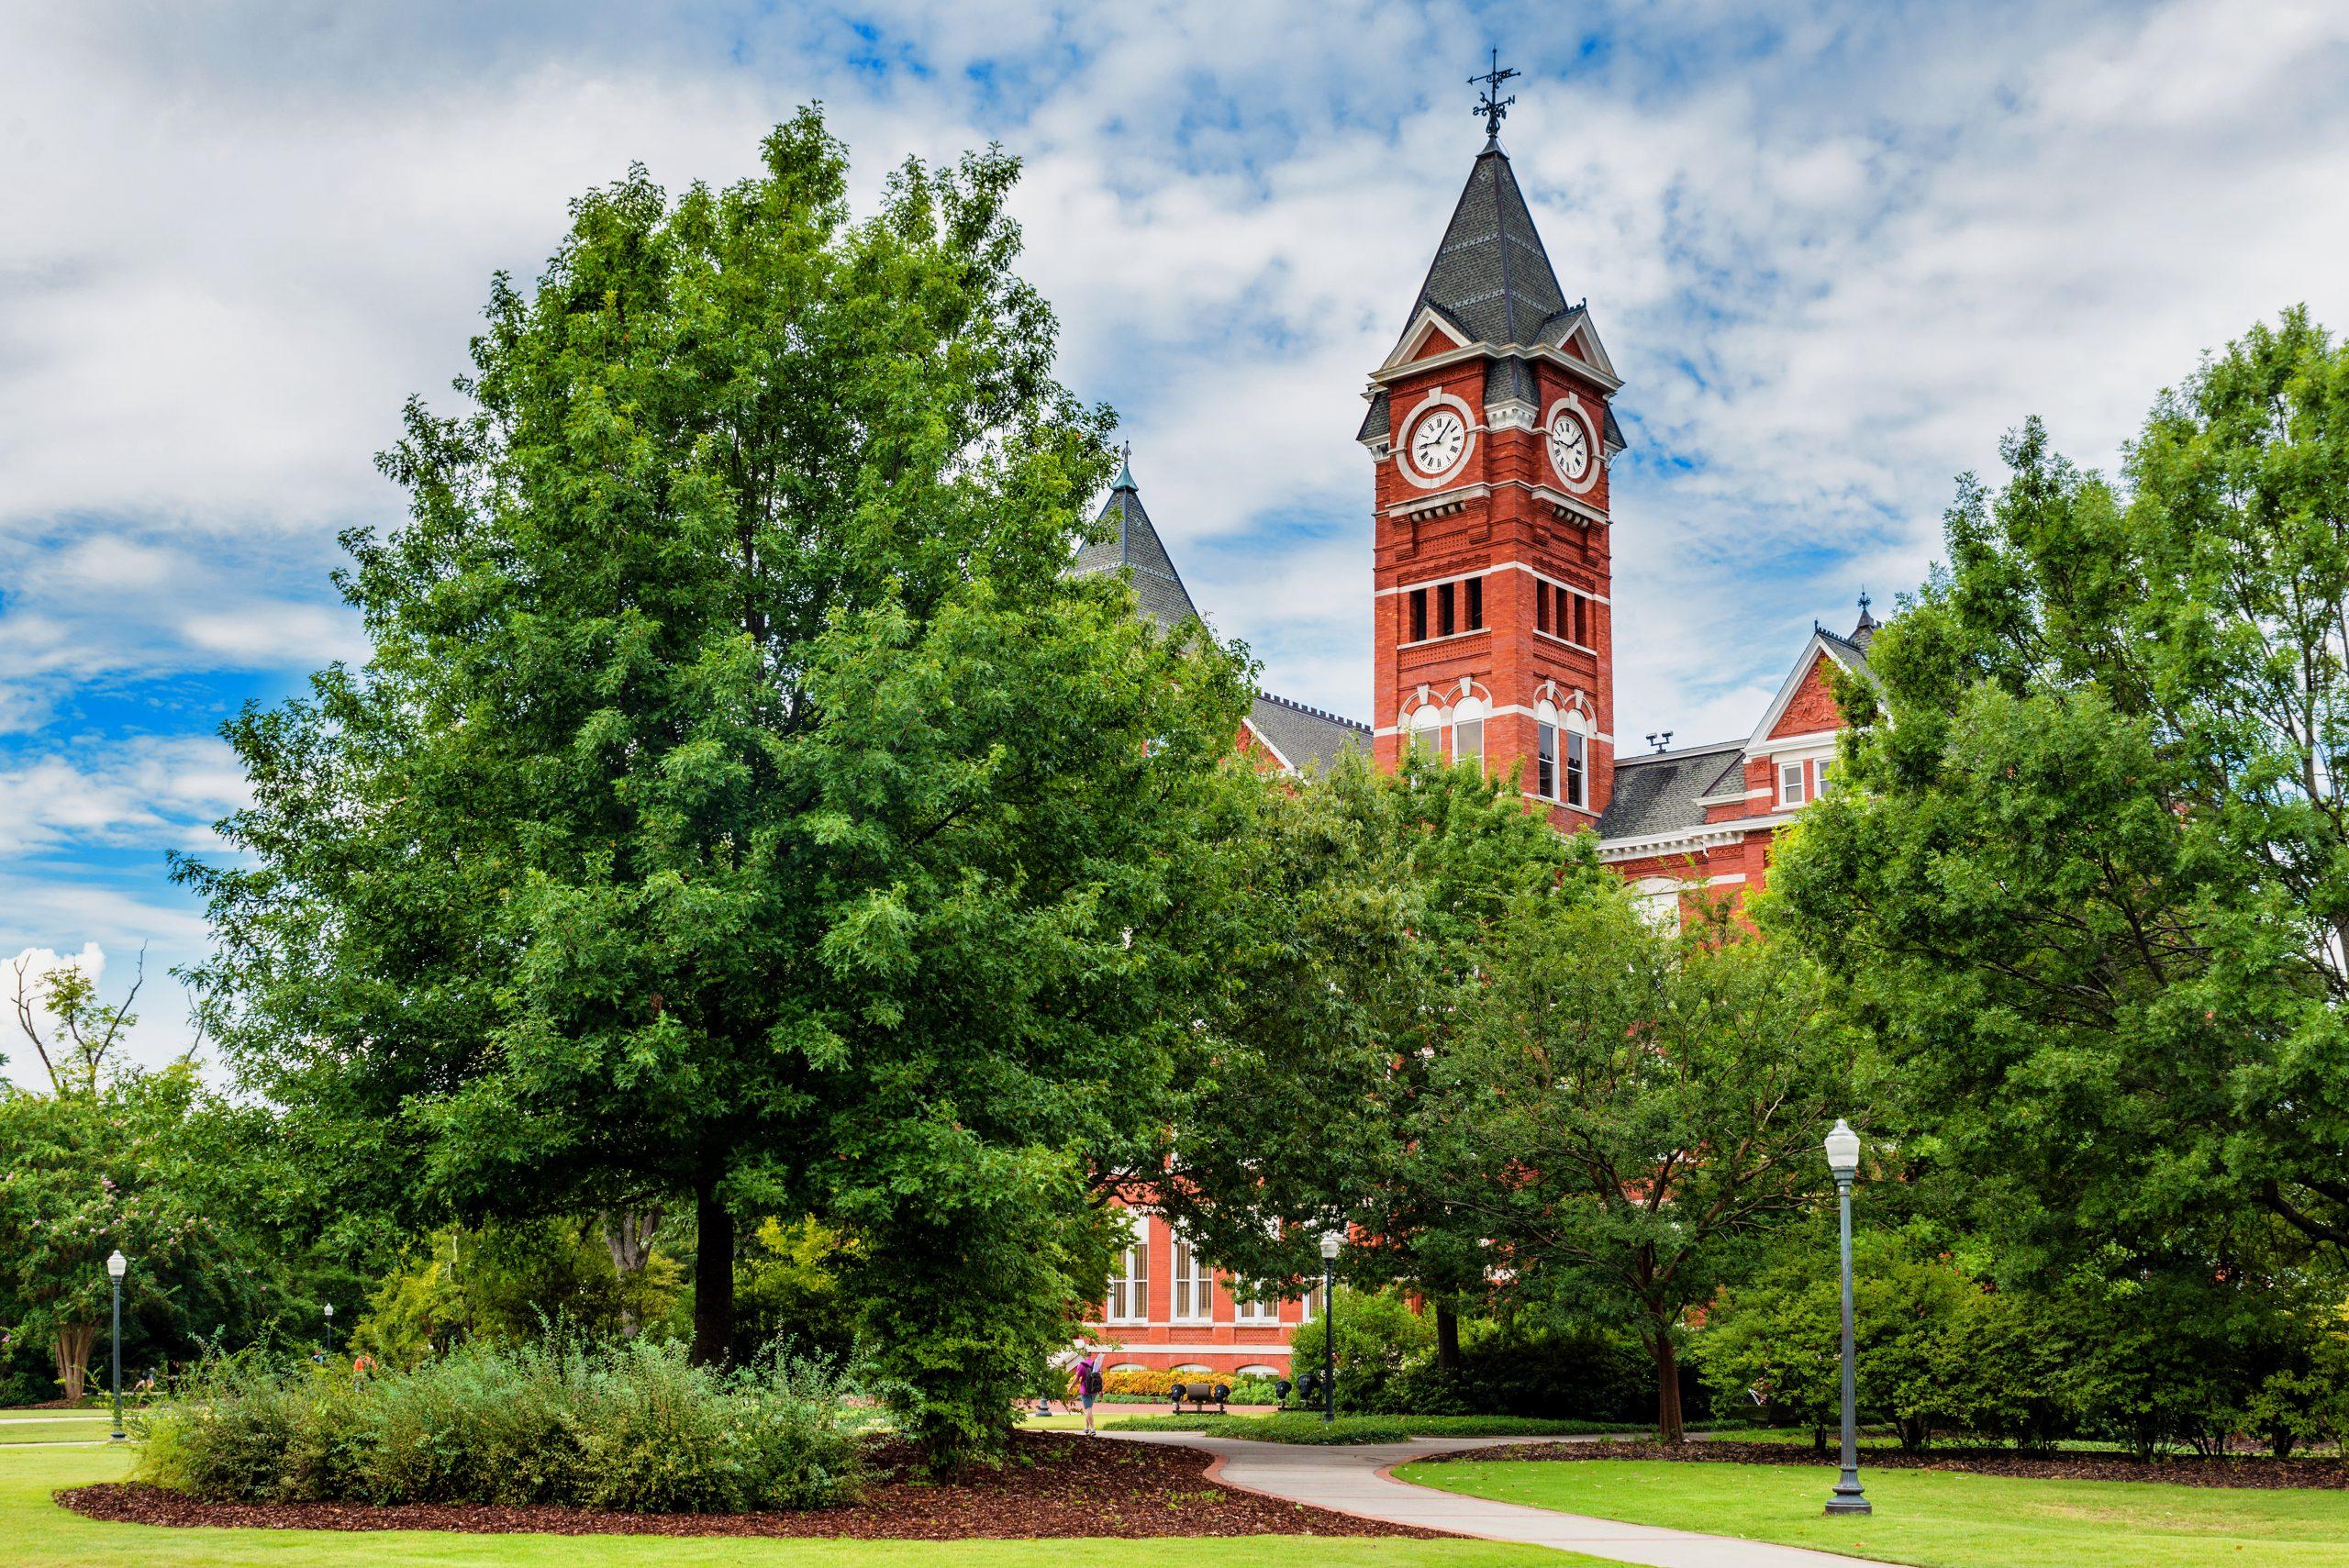 Samford Hall at Auburn University in Alabama